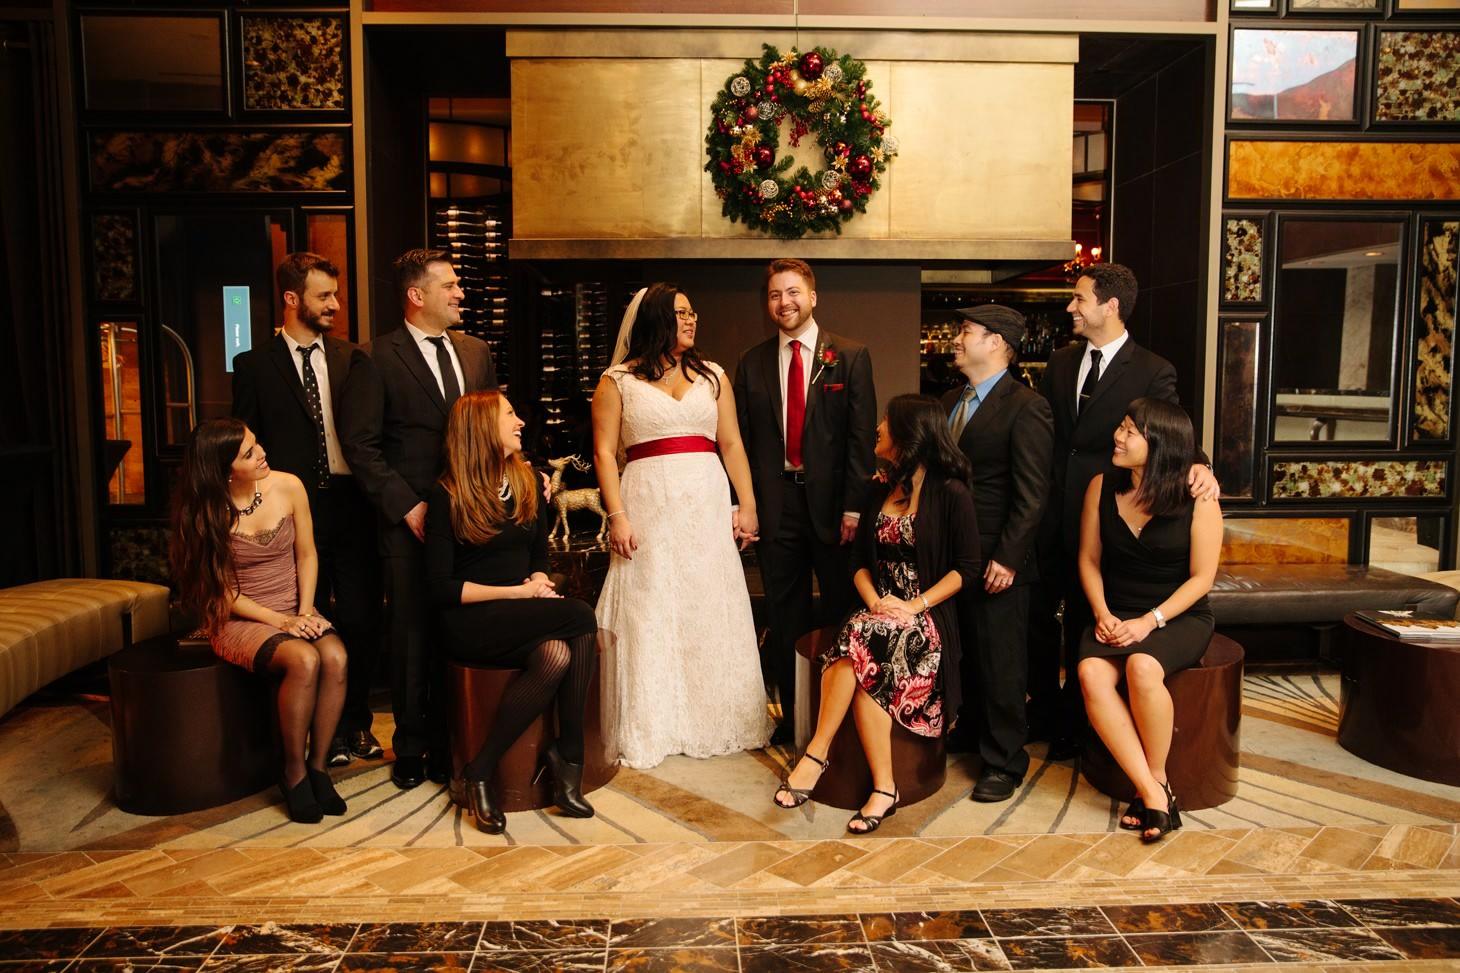 057-nyc-wedding-portrait-photographer-times-square-muse-hotel-winter-wedding-smitten-chickens.jpg